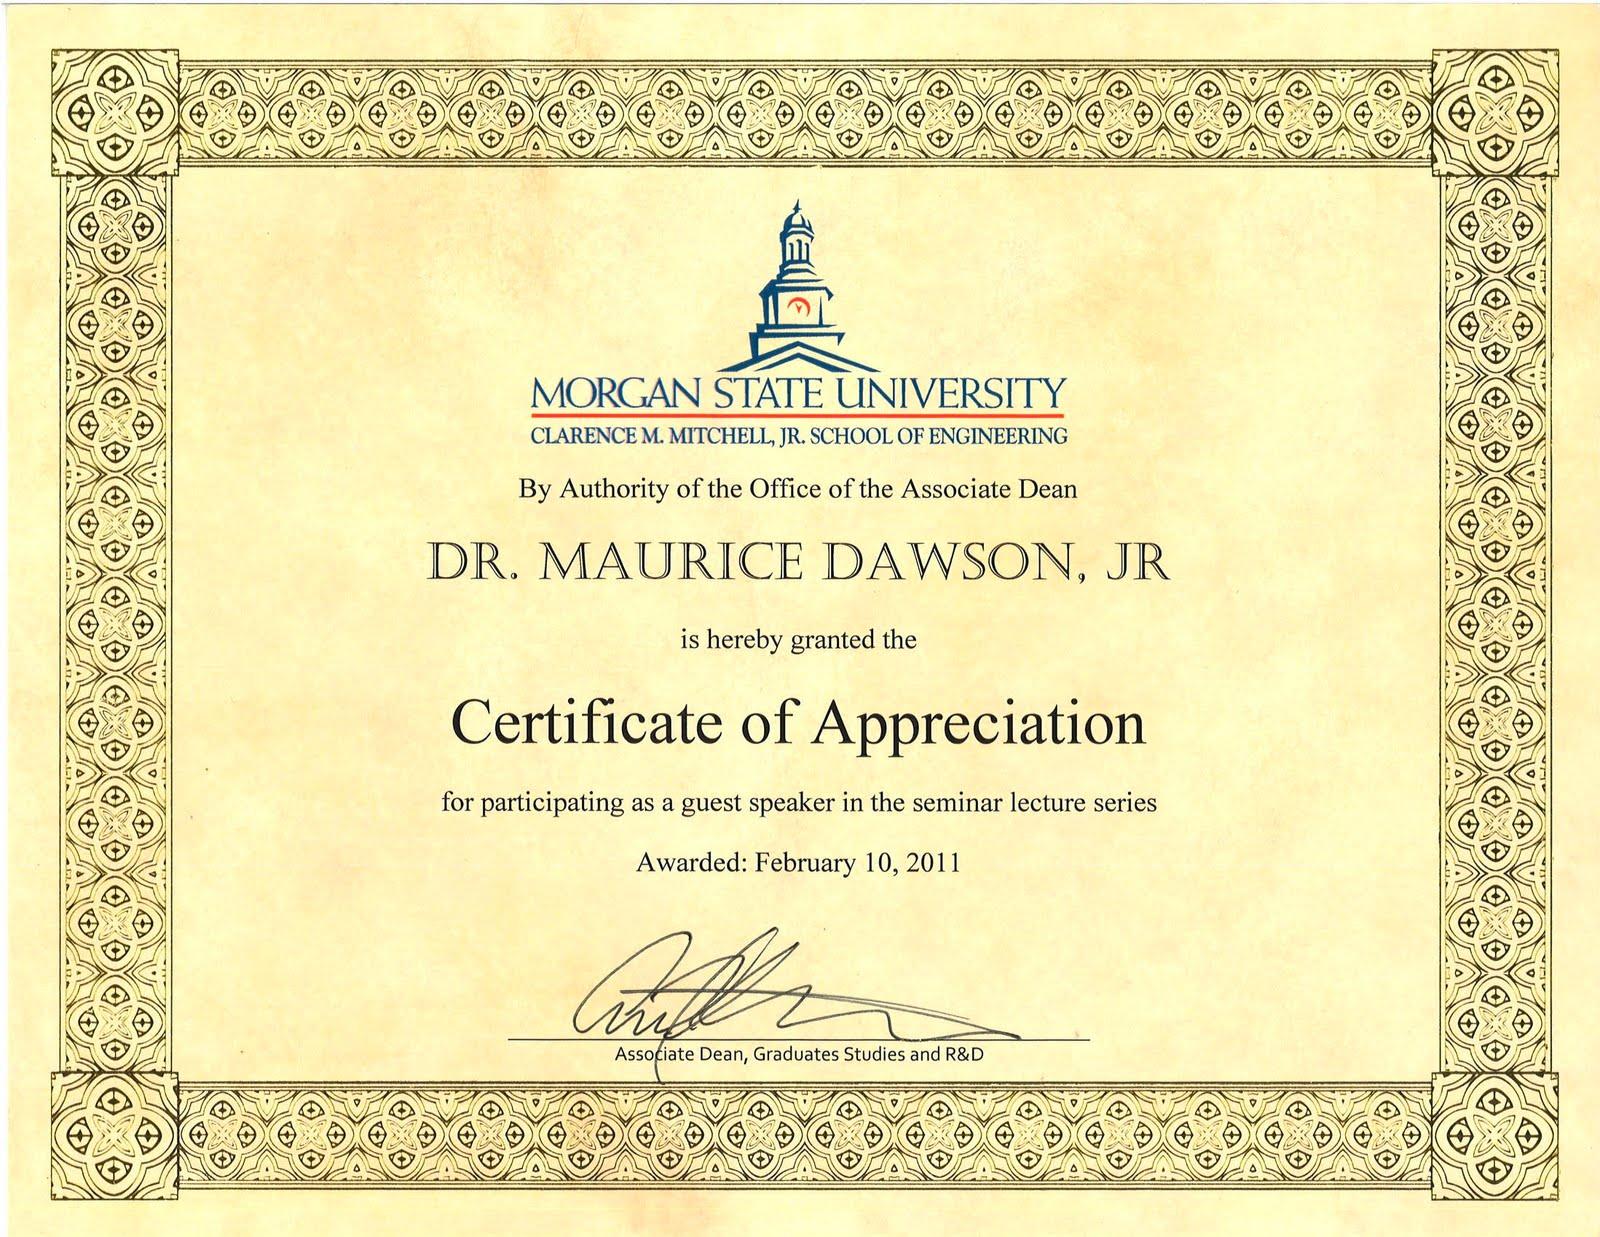 Morgan state university engineering seminar certificate of